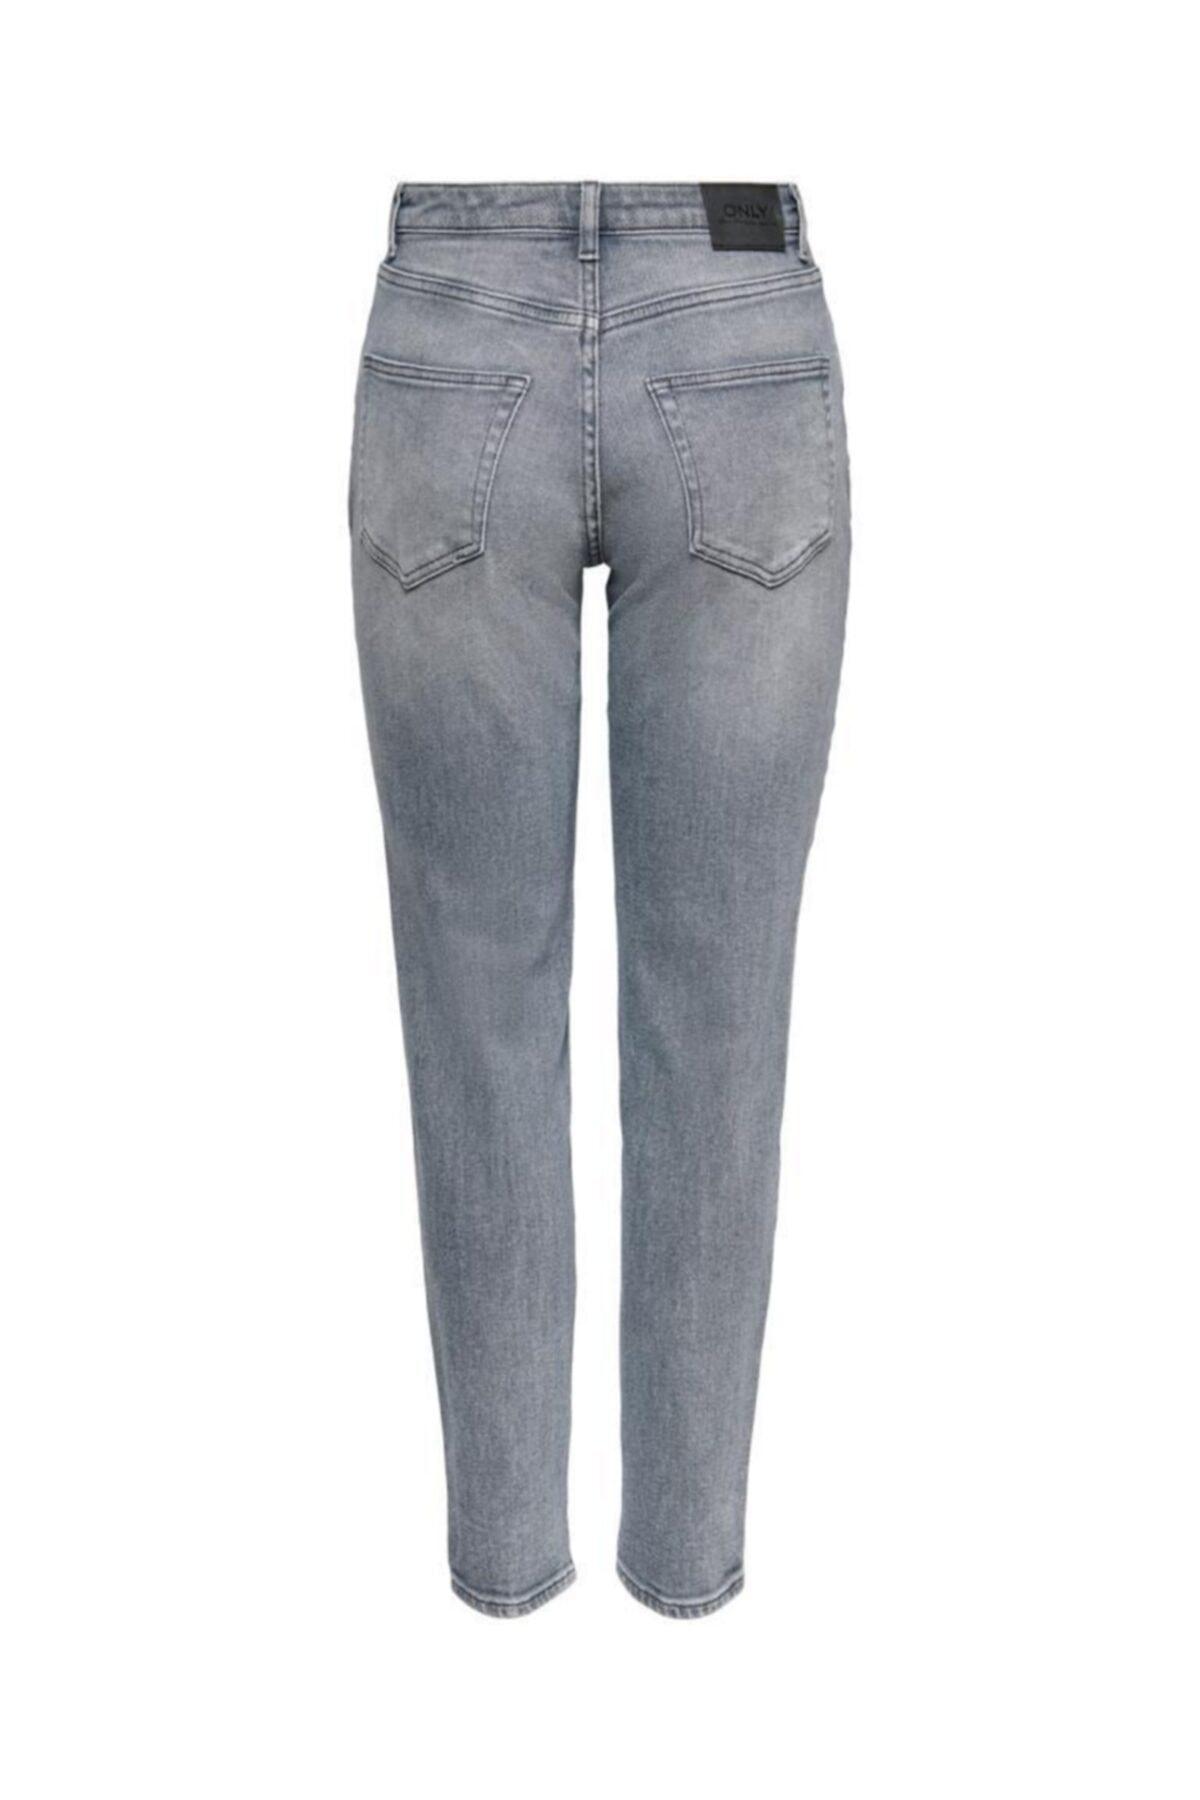 Only Veneda Lıfe Kadın Mom Jeans 2